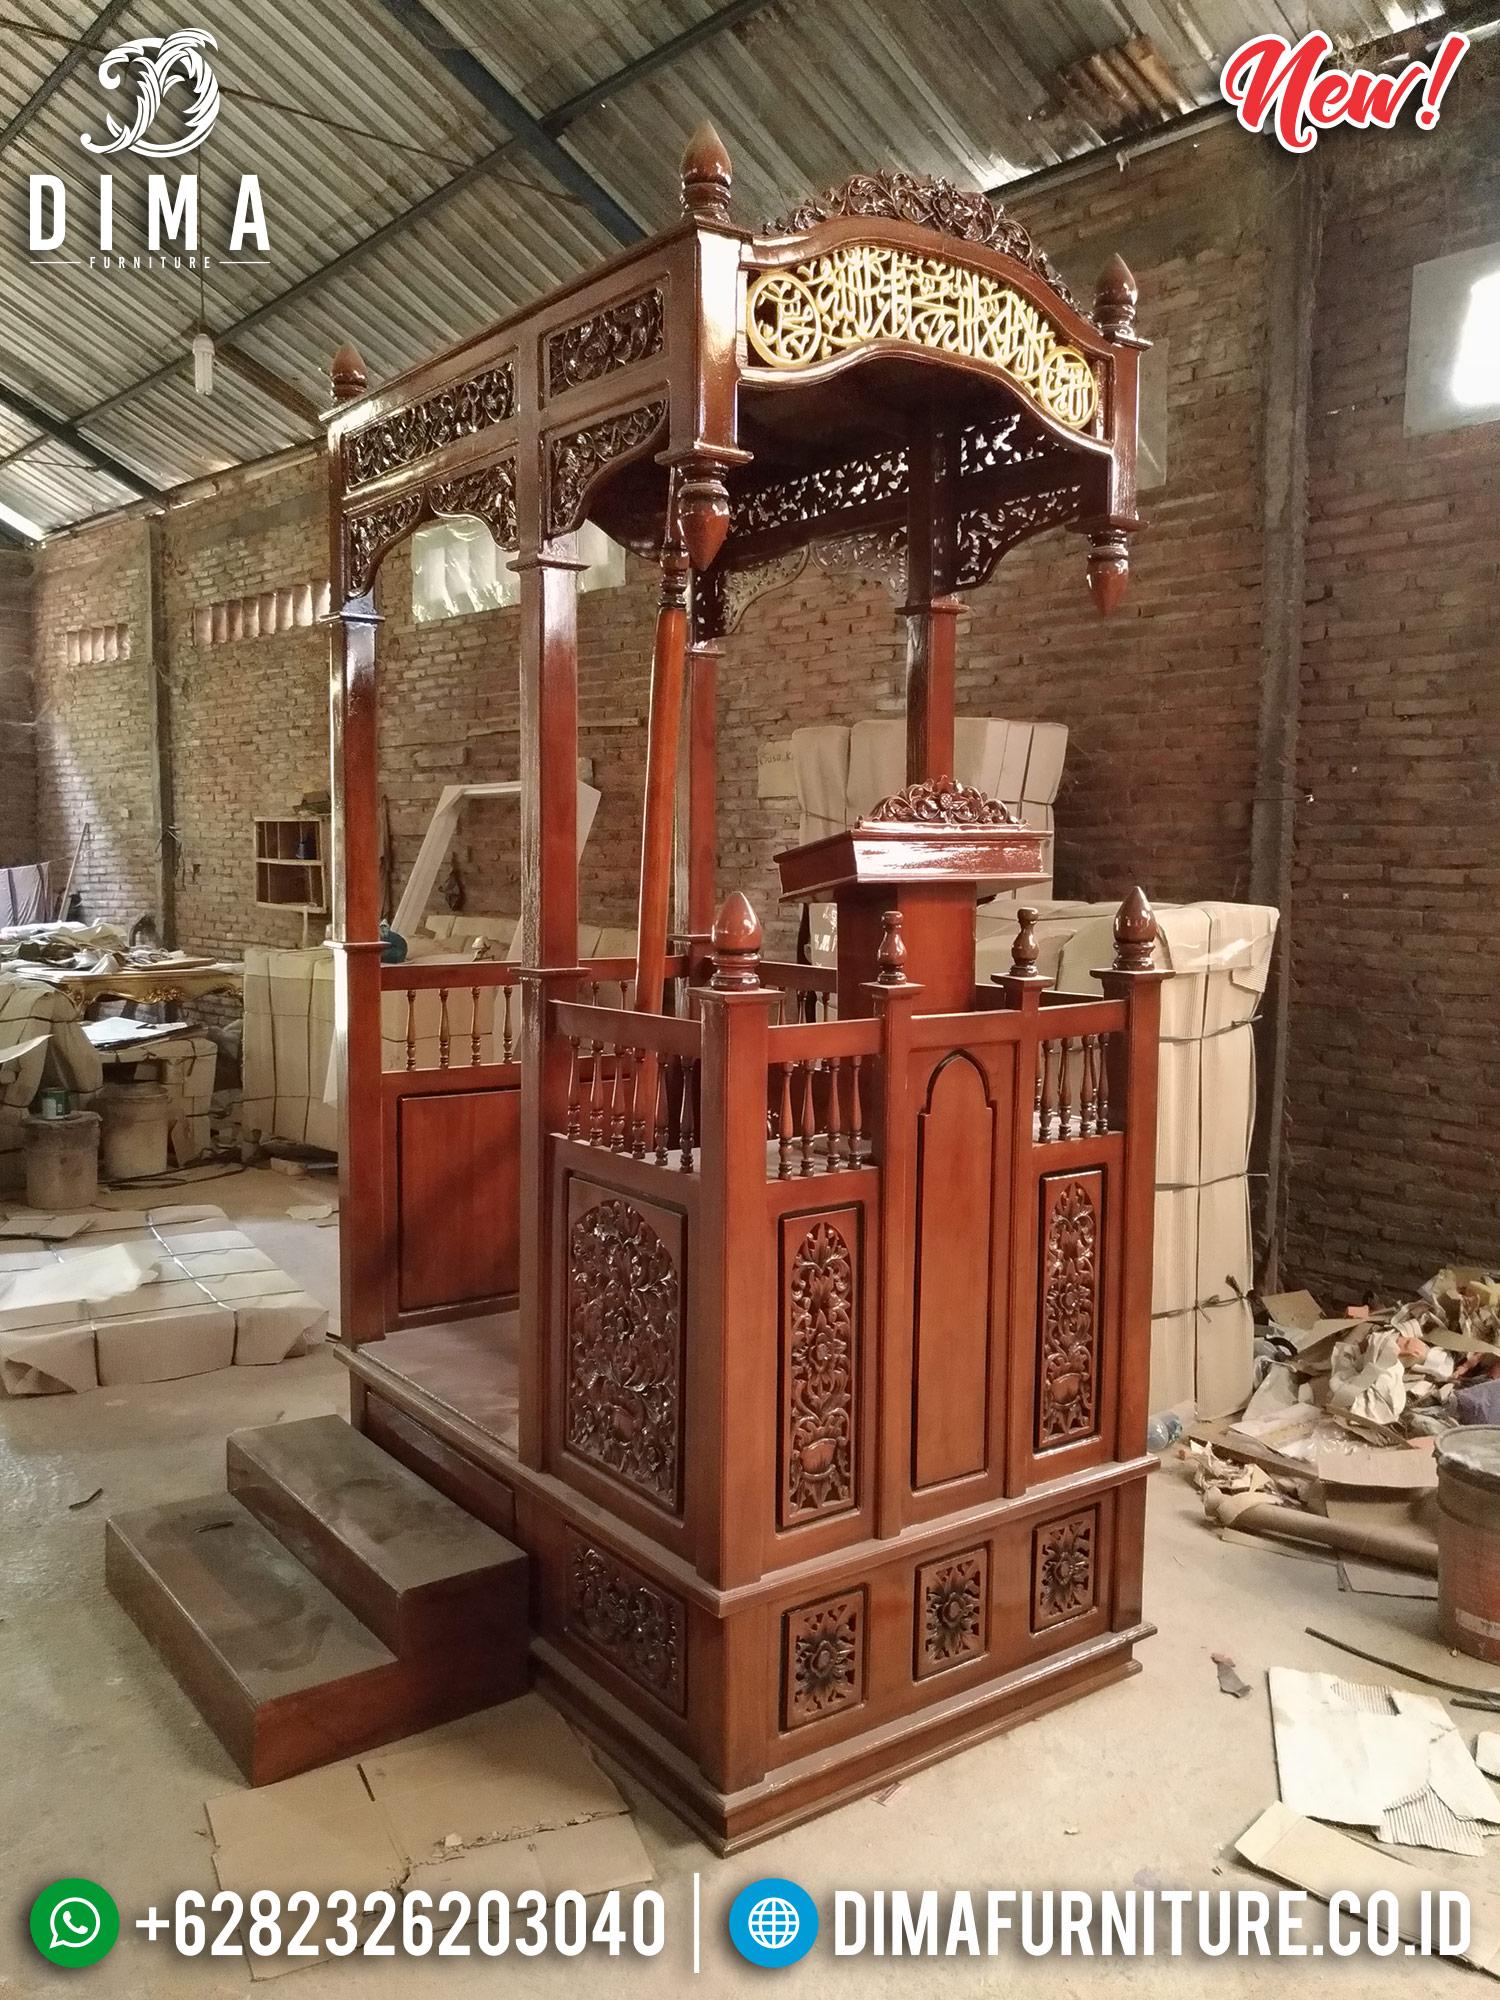 Mimbar Masjid Jati Jepara Ukiran Kaligrafi Gold DF-0995